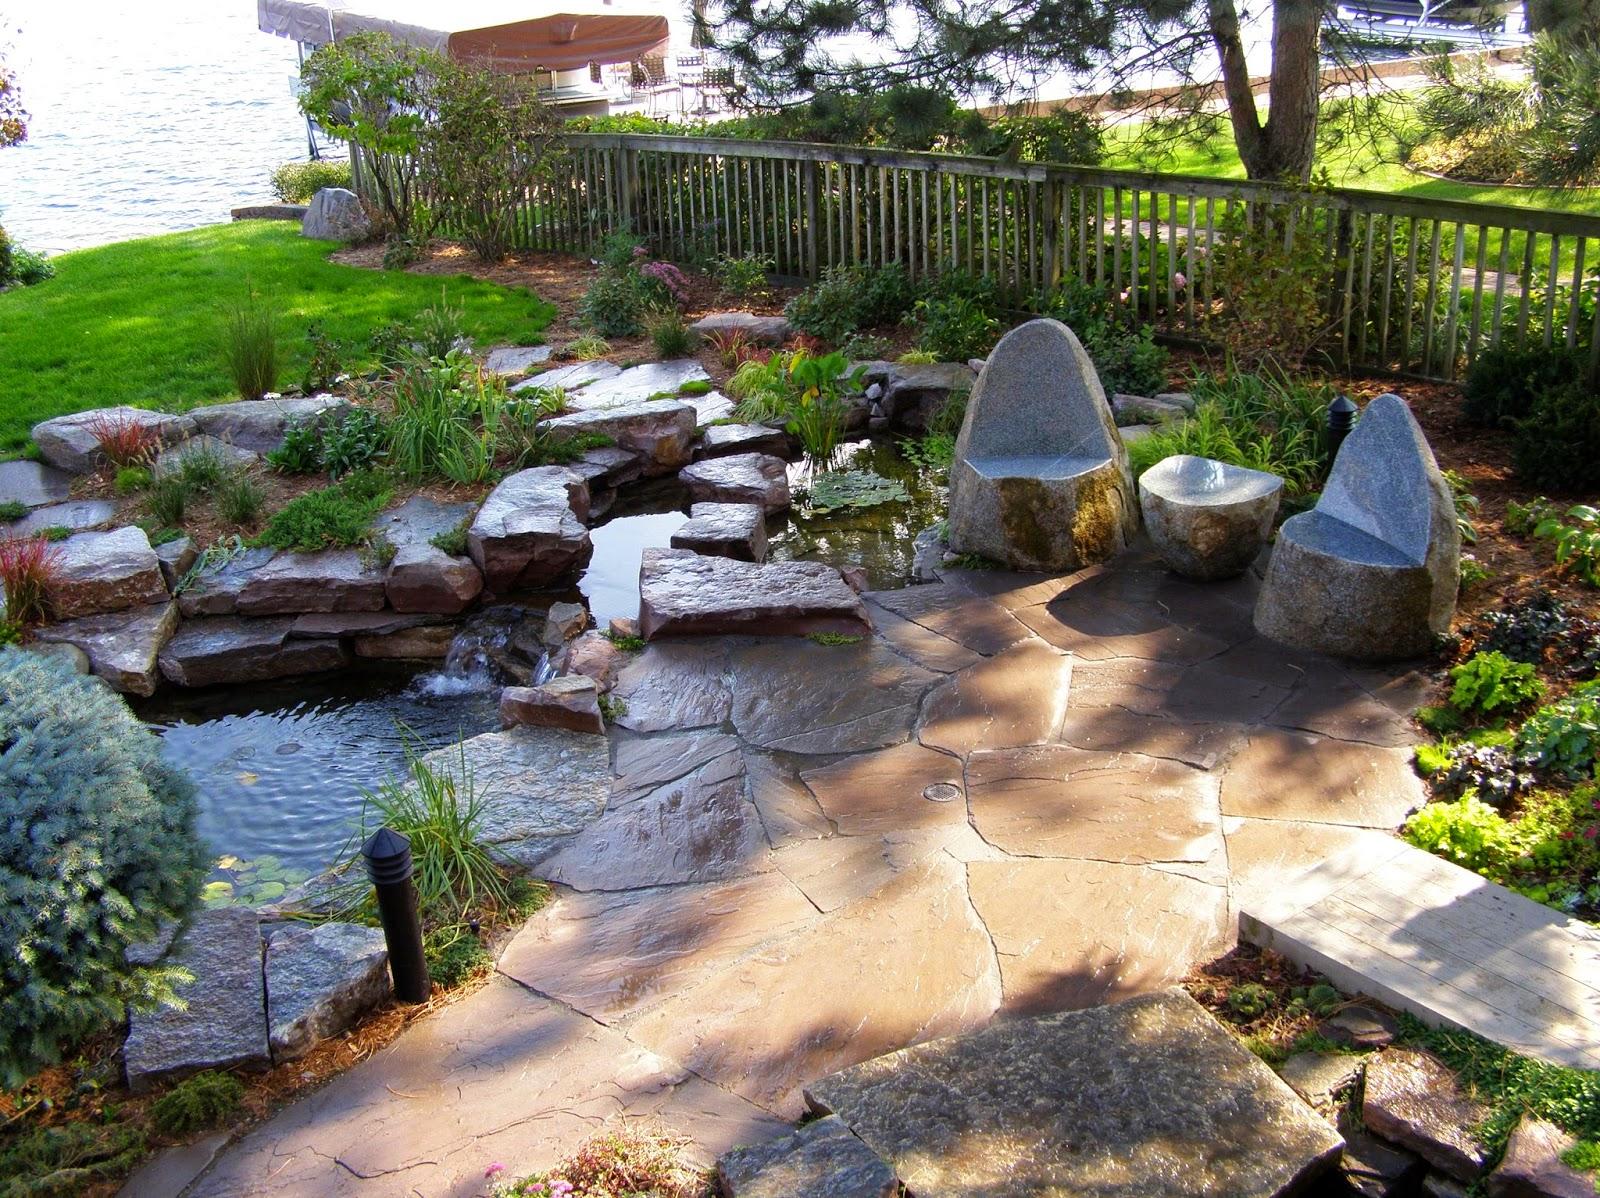 ideas best natural stone patio designs ideas stone patio home: diy patio pond